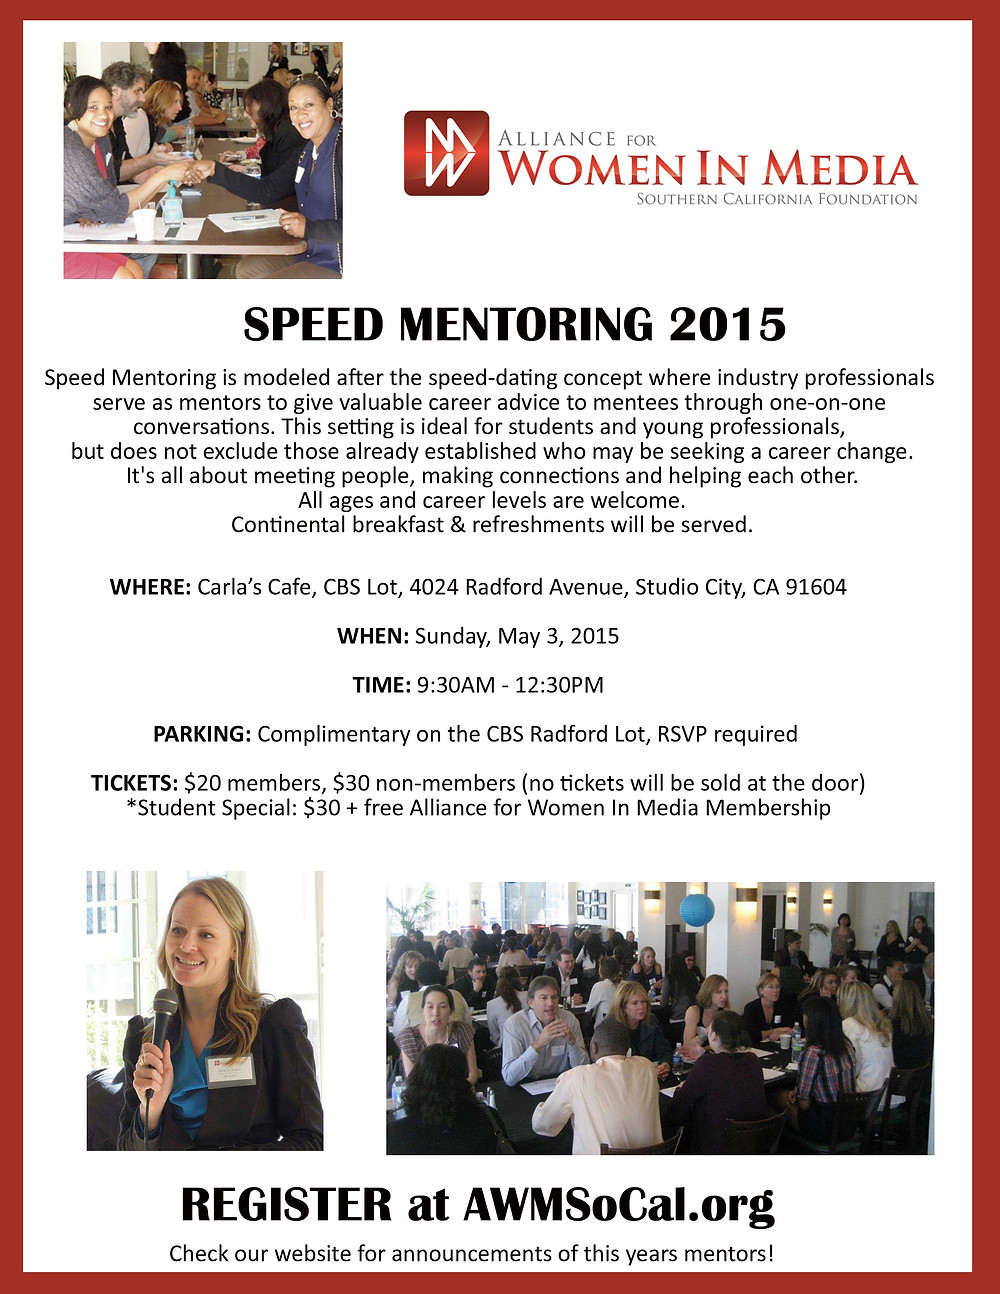 AWM_speed mentoring flyer2.jpg